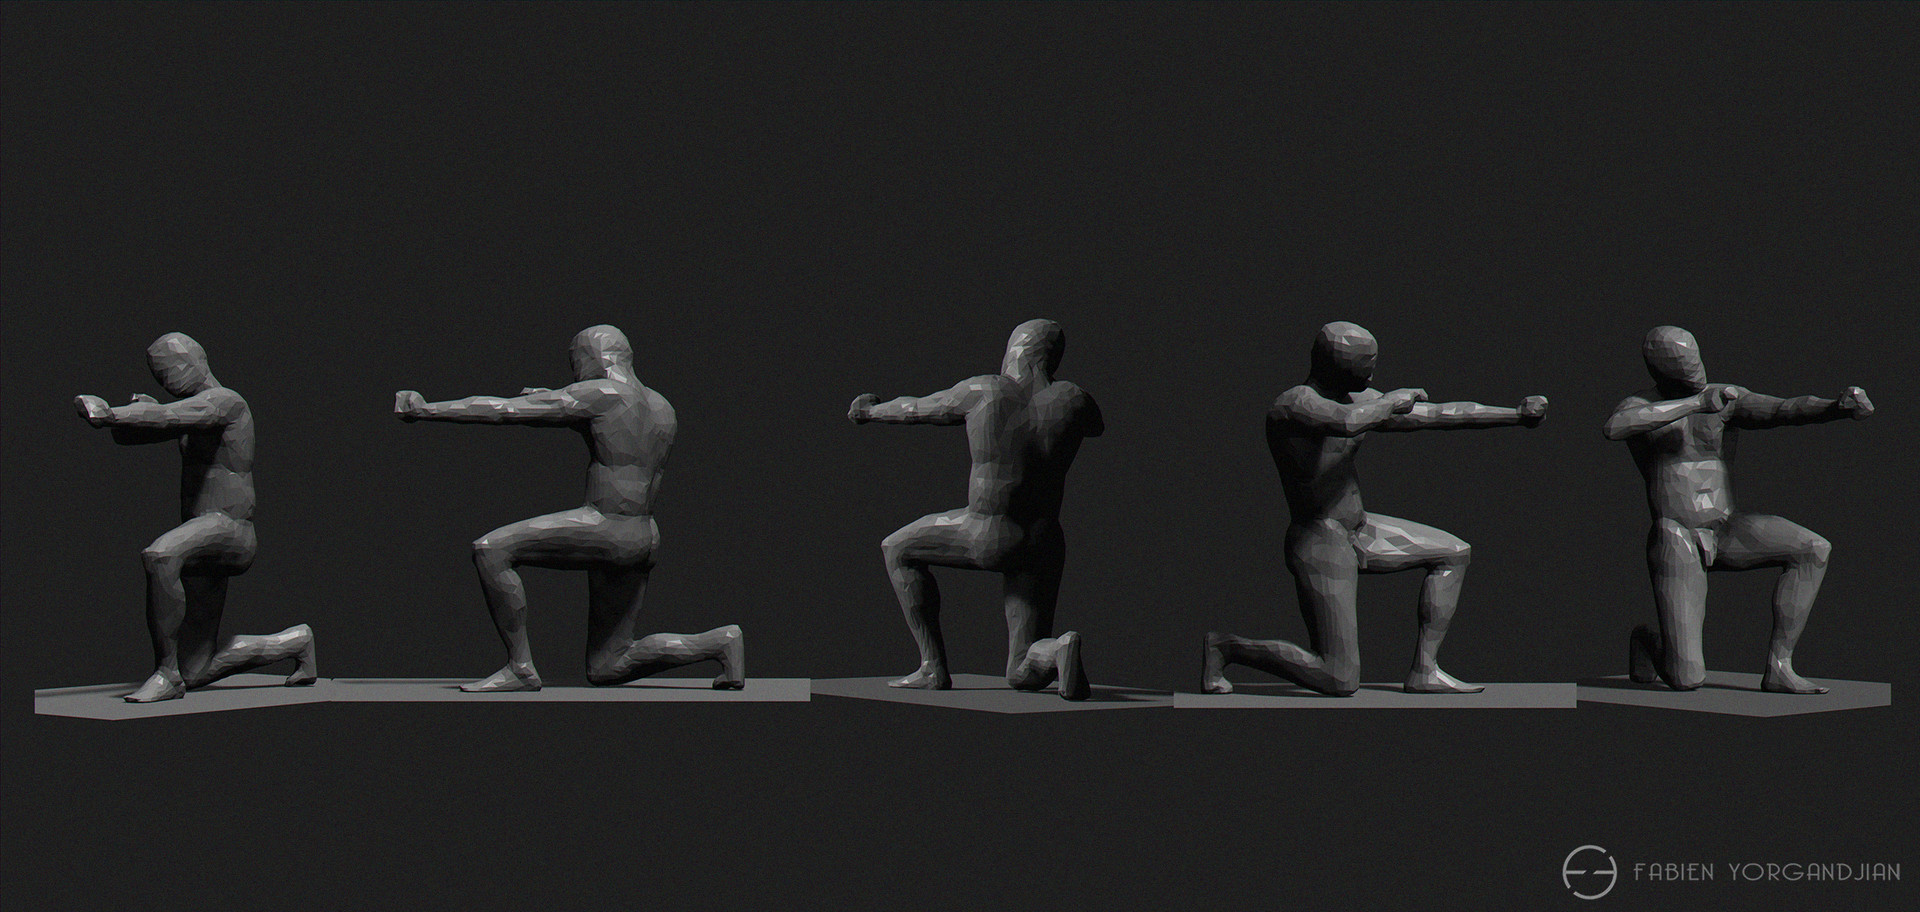 Fabien yorgandjian male quick sculpt